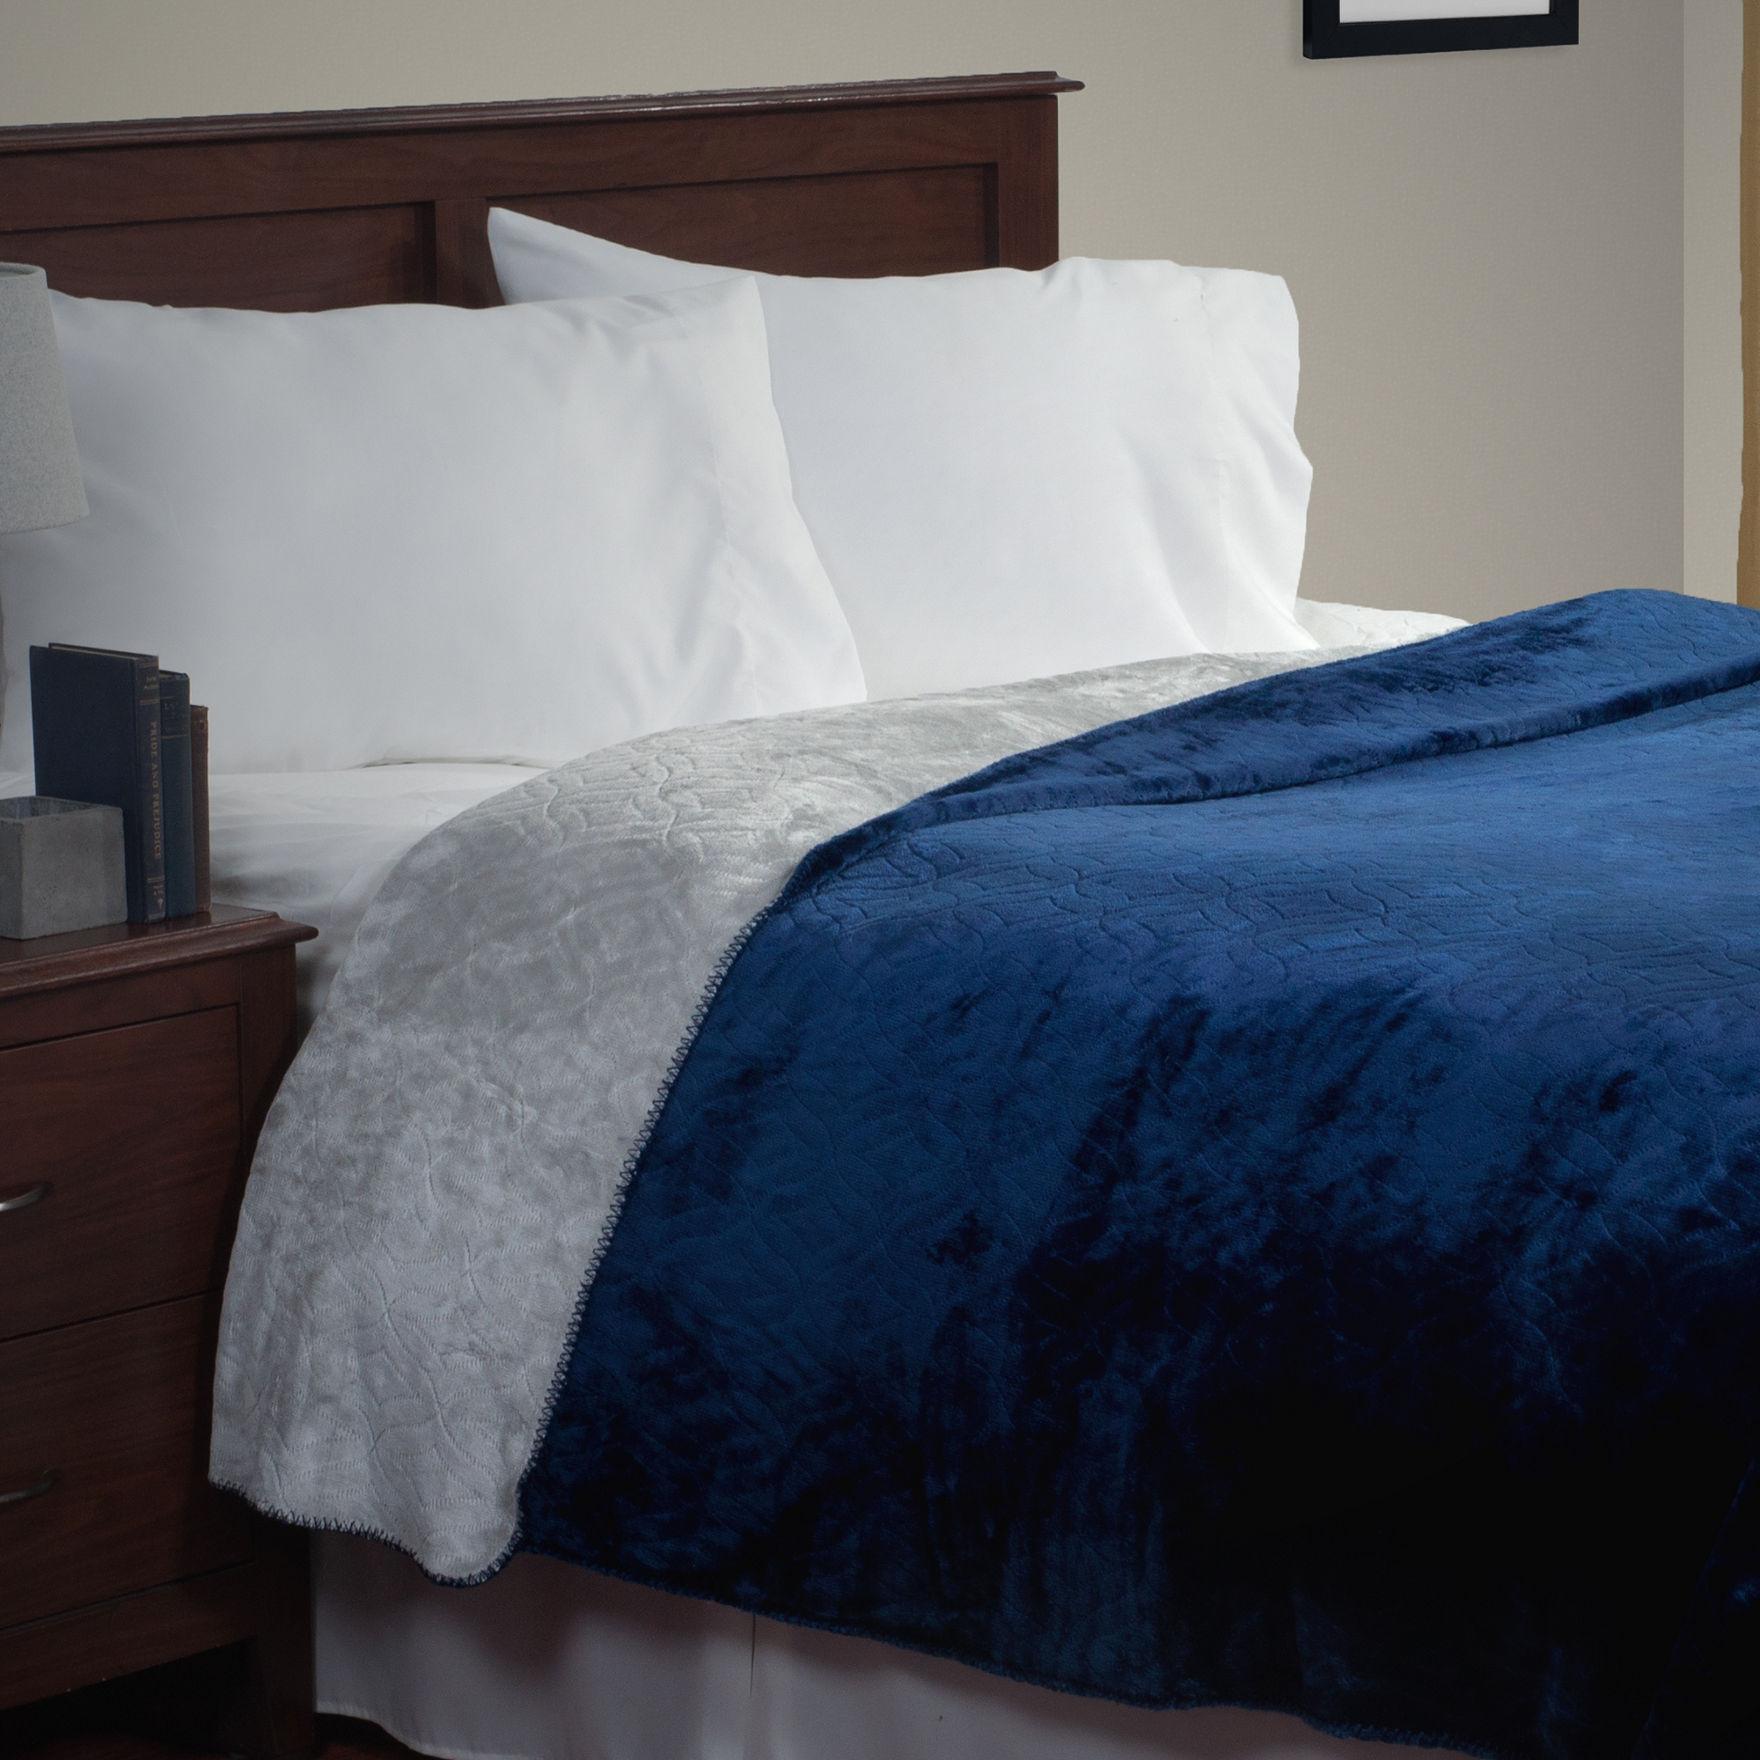 Lavish Home Blue / Grey Blankets & Throws